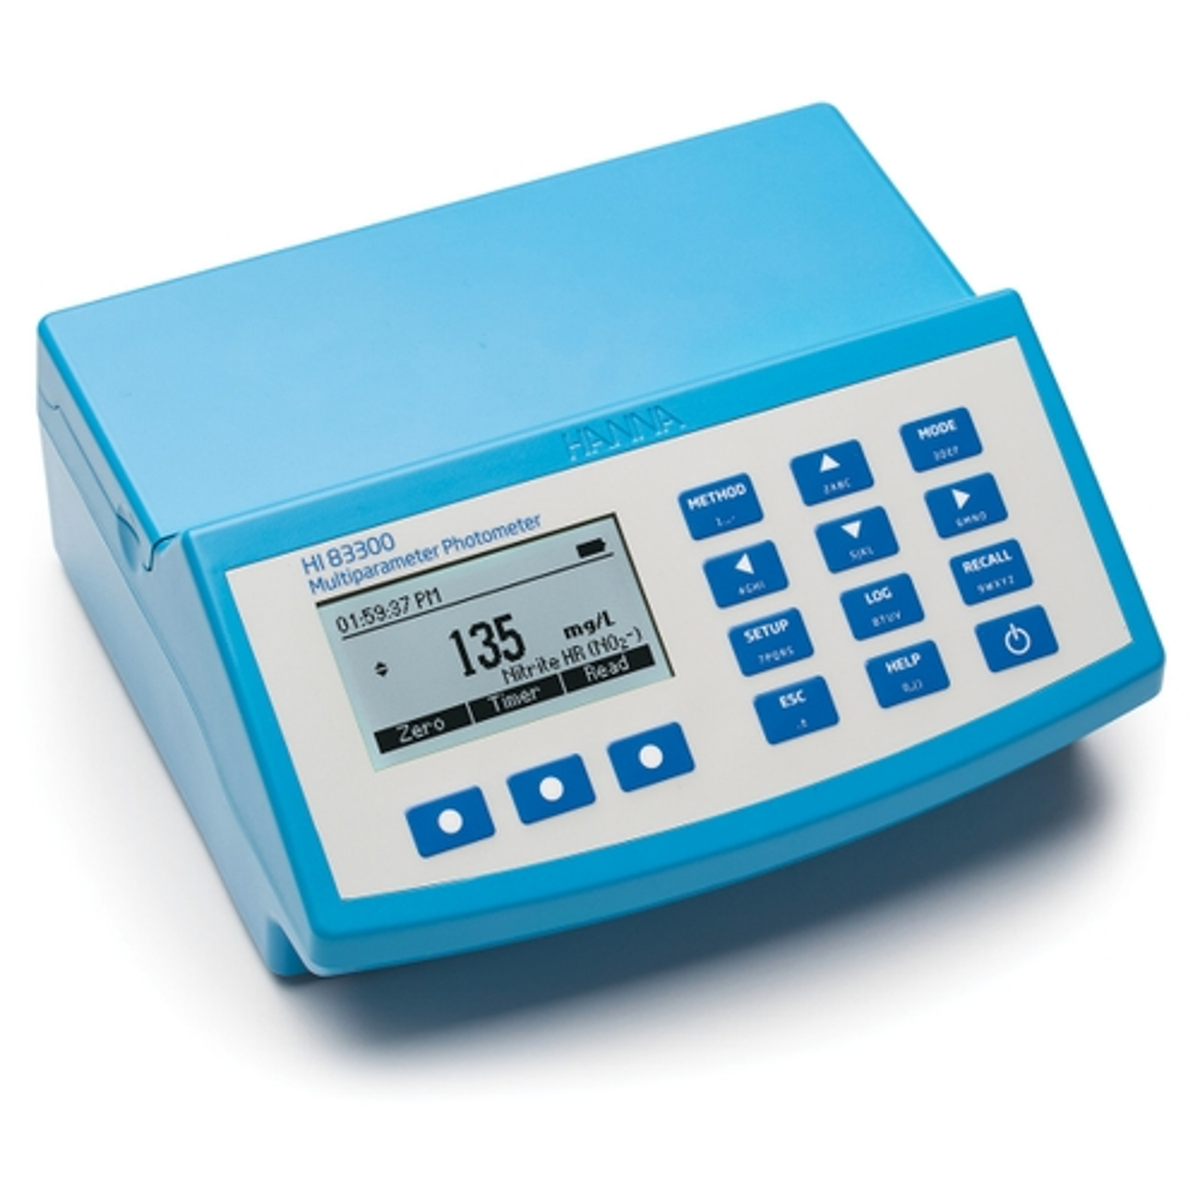 Advanced Multiparameter Benchtop Photometer and pH meter - HI83300